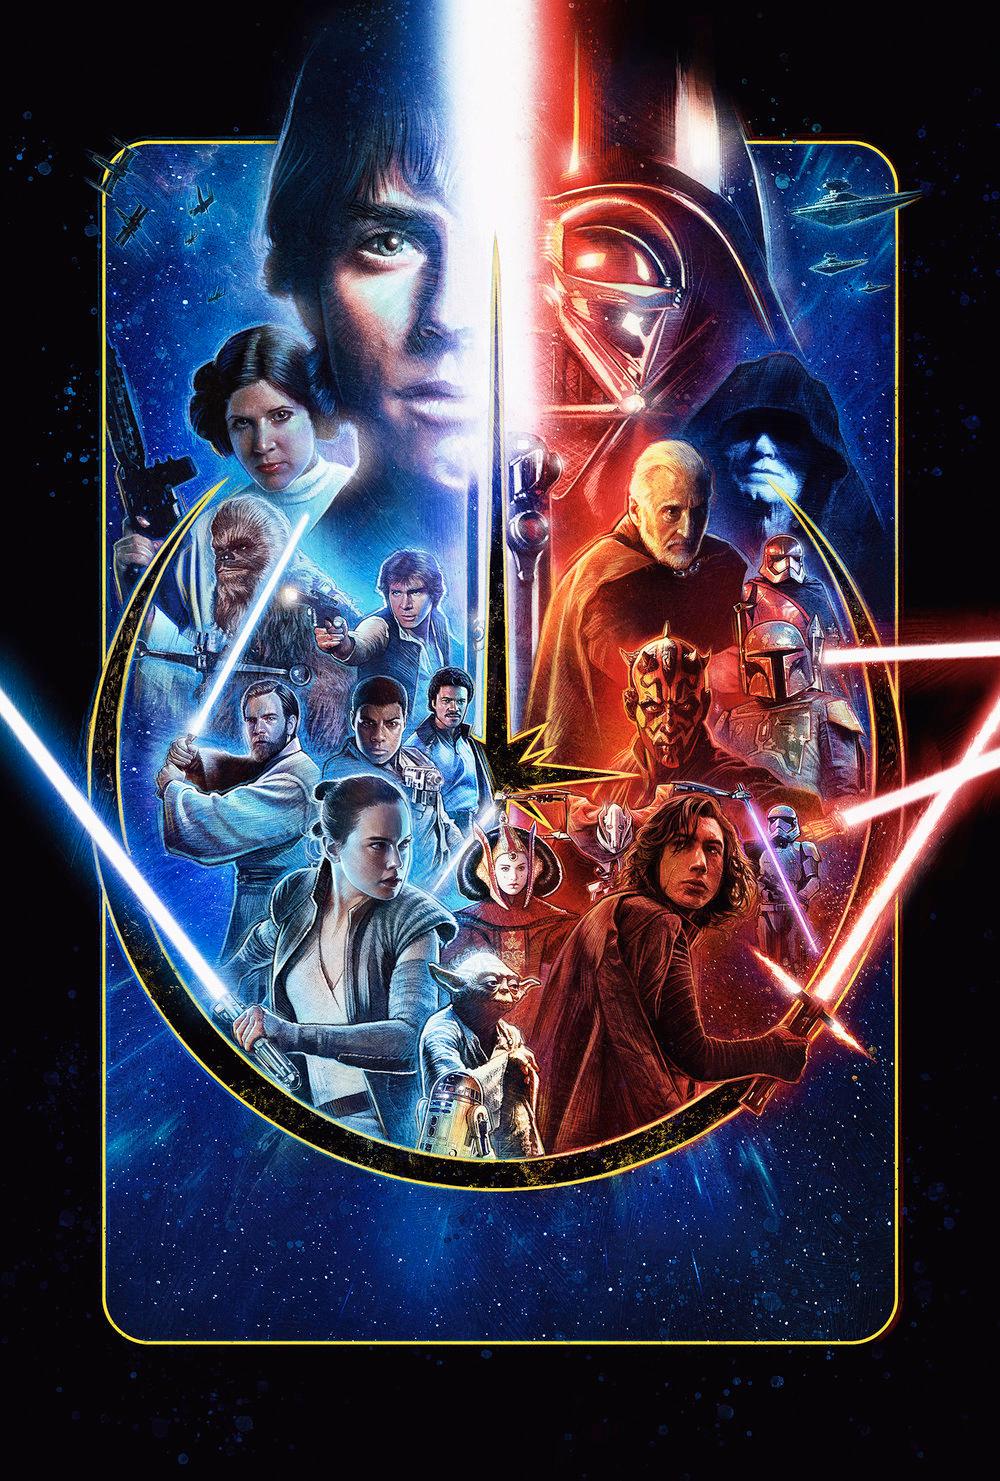 Paul Shipper Studio Star Wars Celebration 2019 Key Art Star Wars Celebration Star Wars Action Figures Star Wars Wallpaper